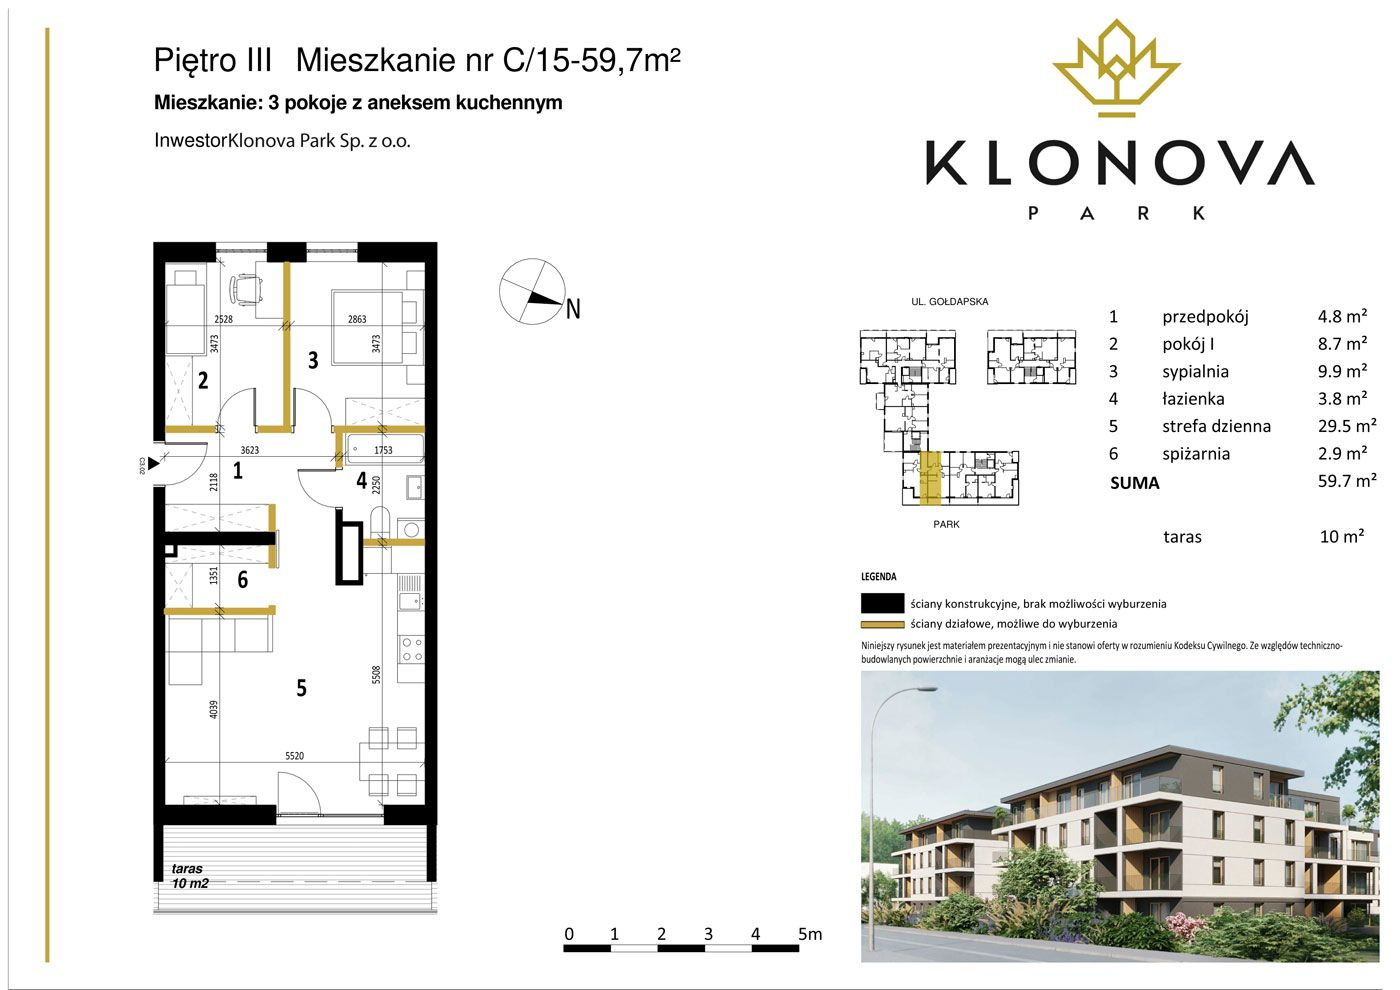 Apartamenty Klonova Park - Plan mieszkania C/15